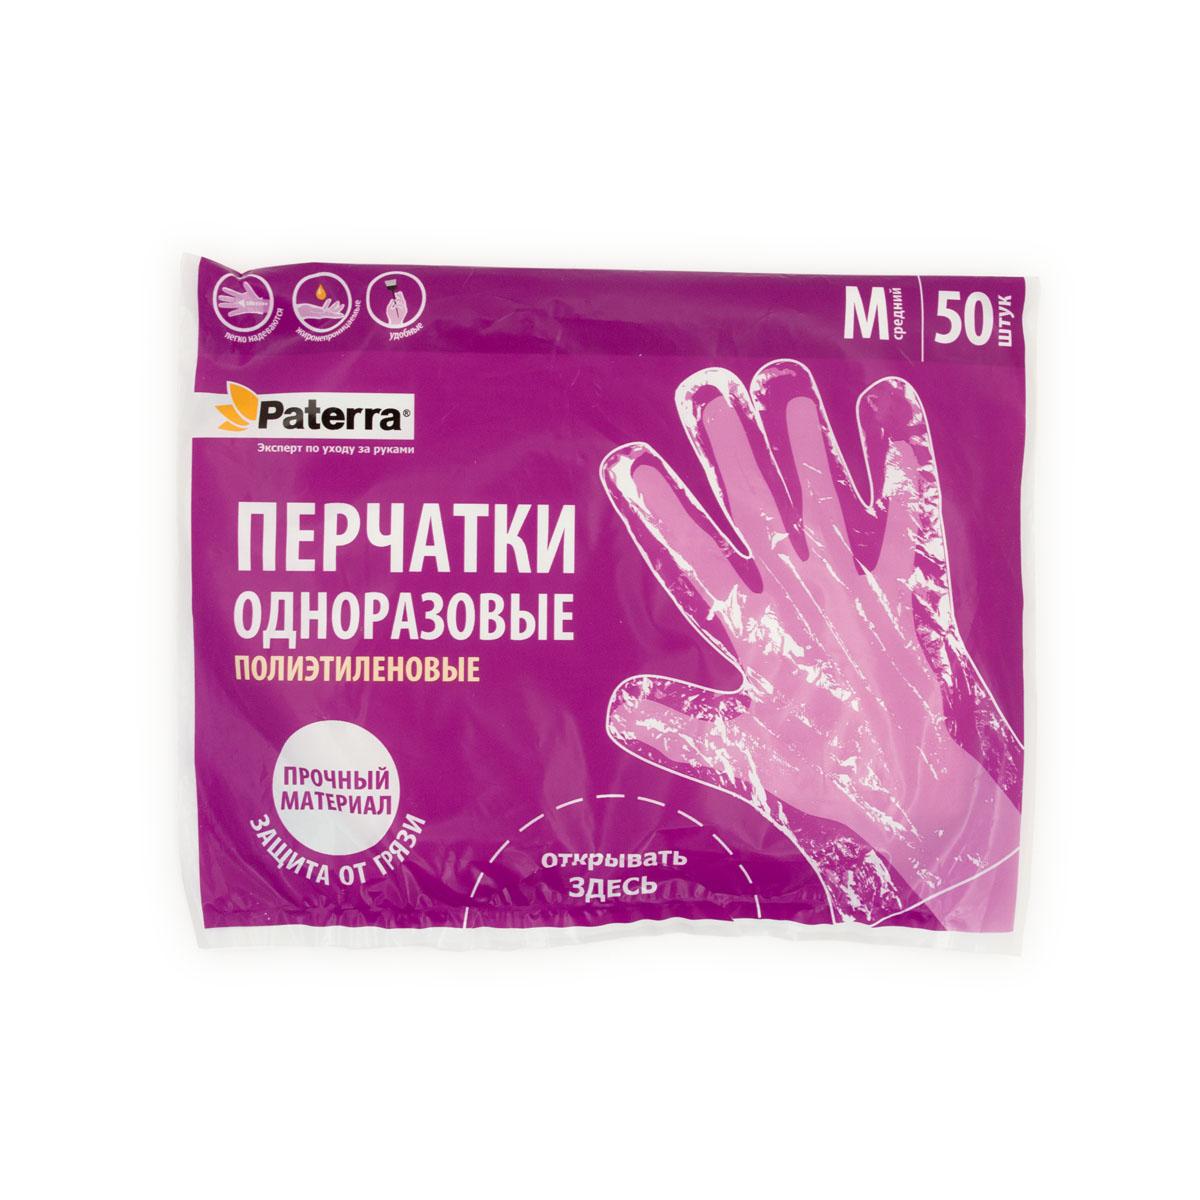 "Перчатки одноразовые ""Paterra"", размер 8 (M), 50 шт"